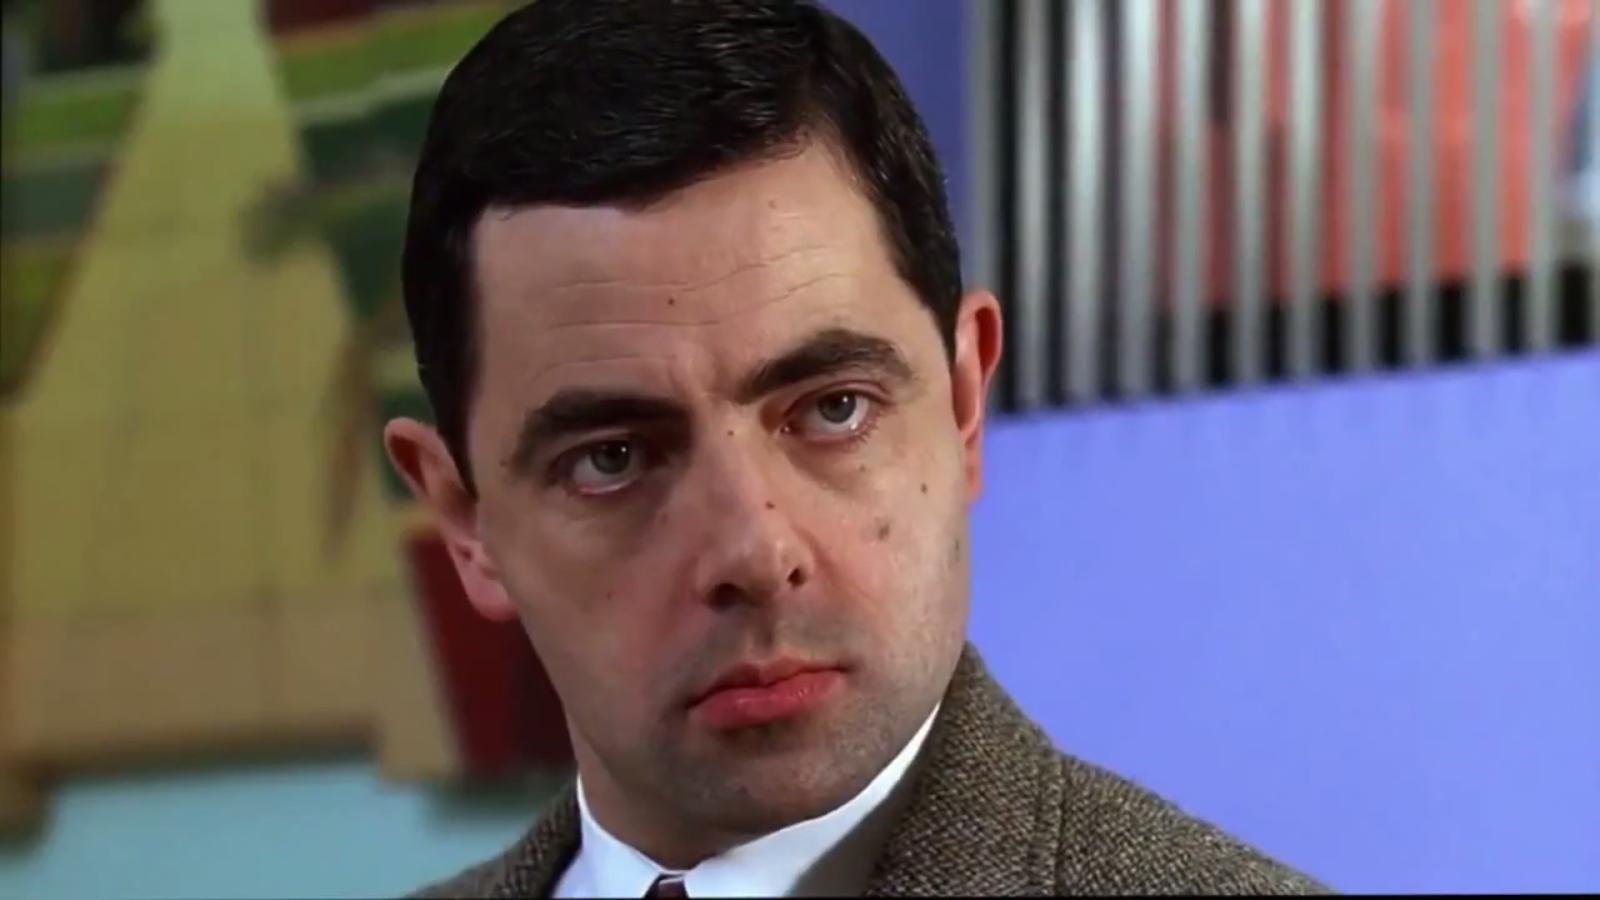 Aom Movies Et Al Bean 1997